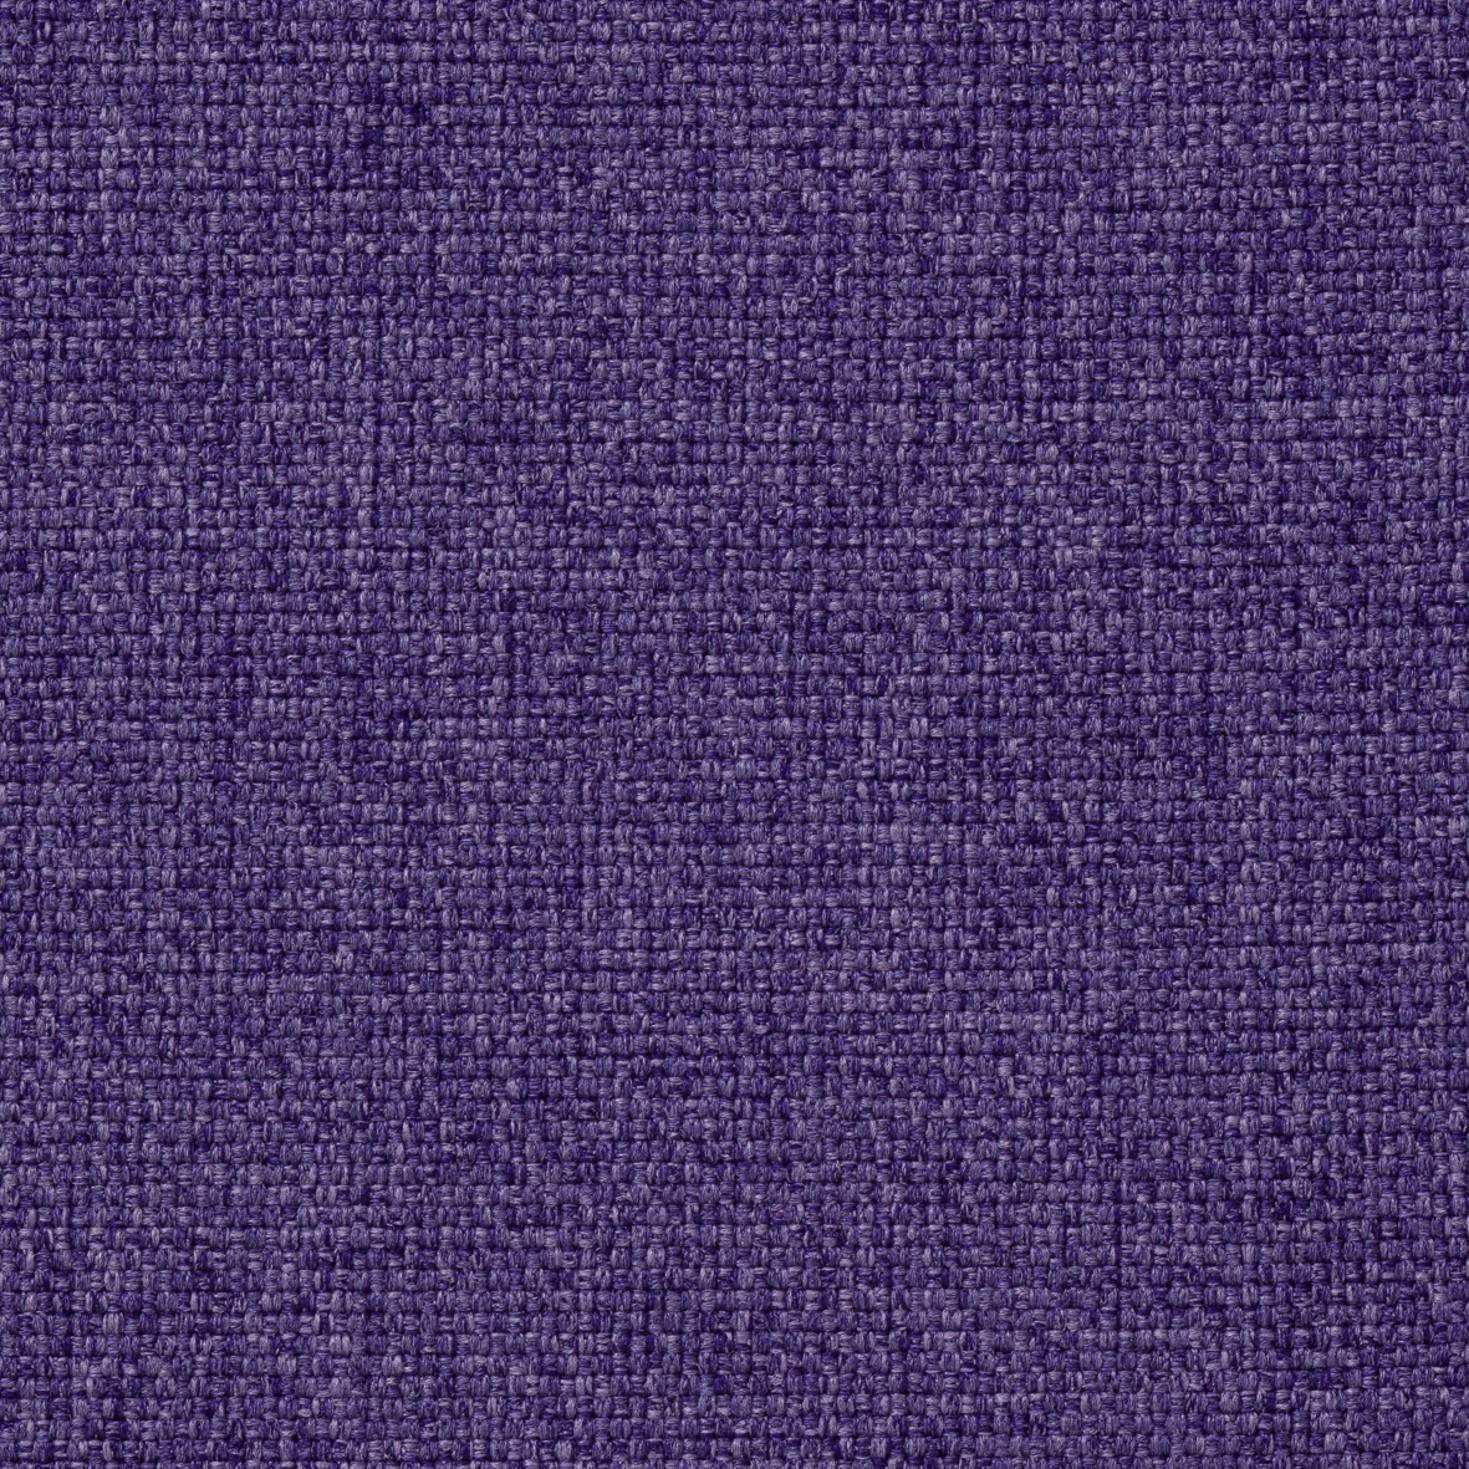 Medley Dark Purple 65086